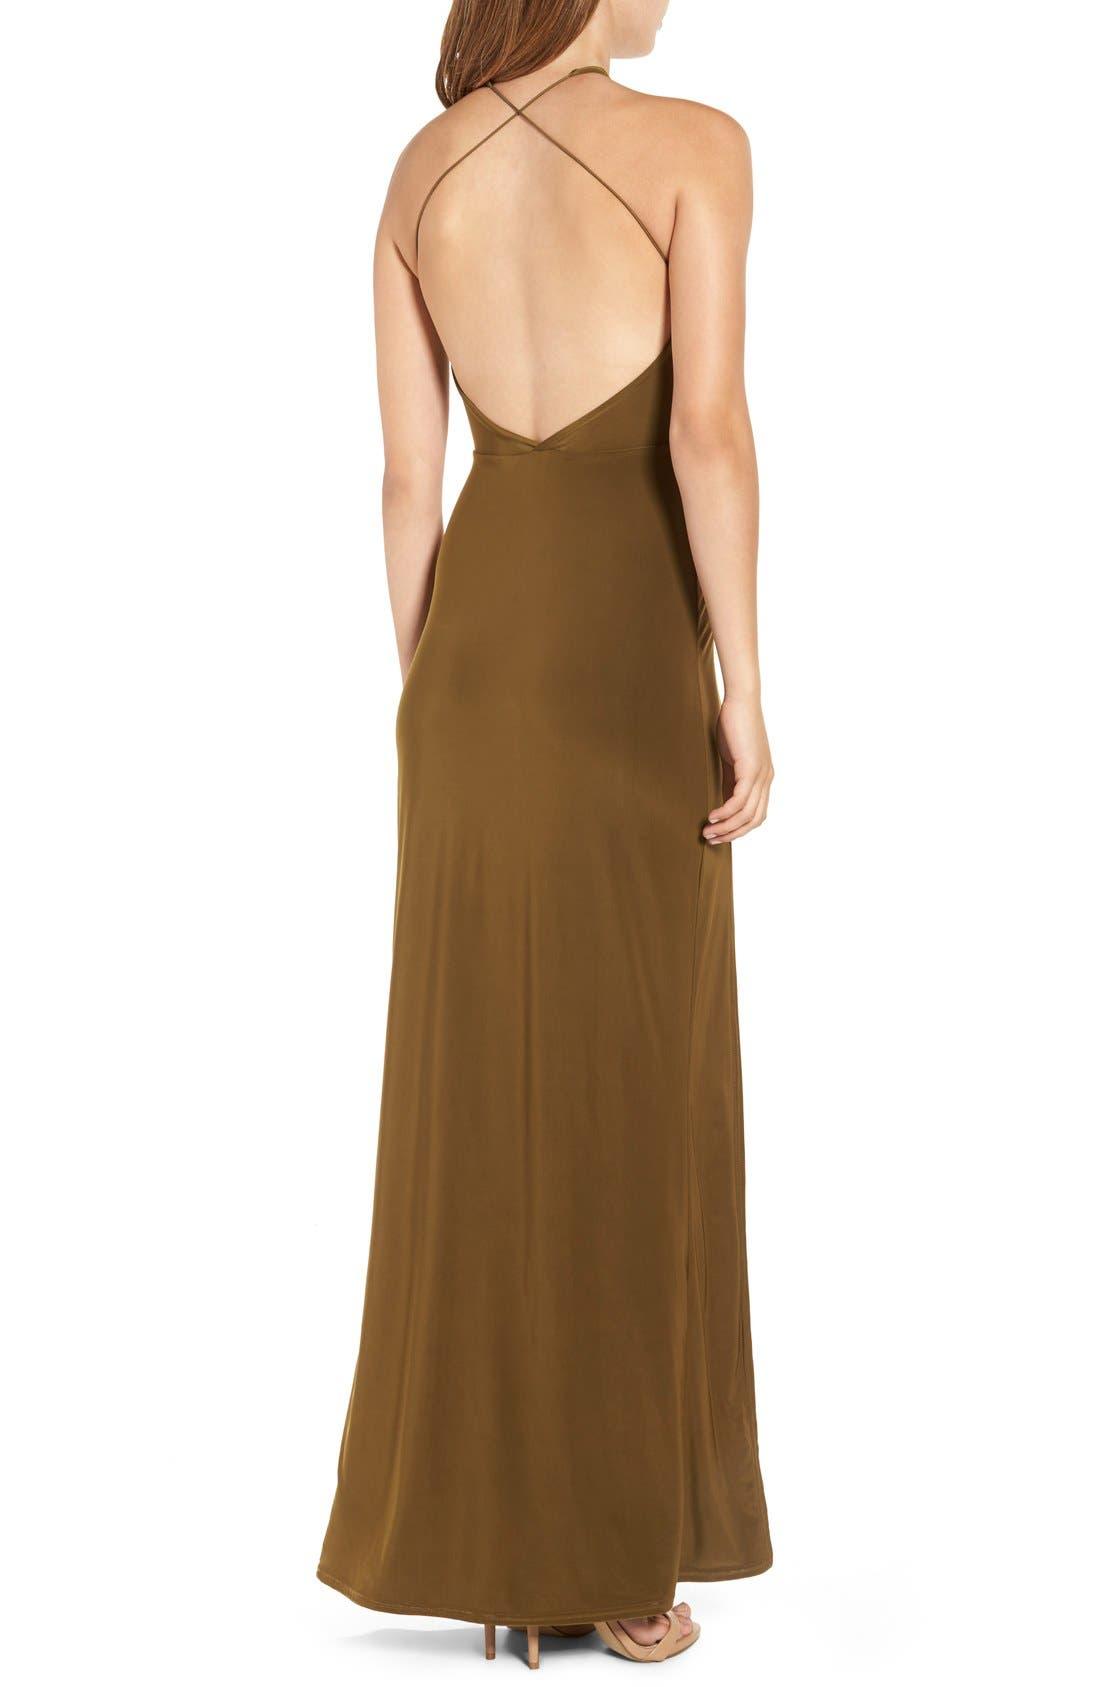 Strappy Back Maxi Dress,                             Alternate thumbnail 4, color,                             291